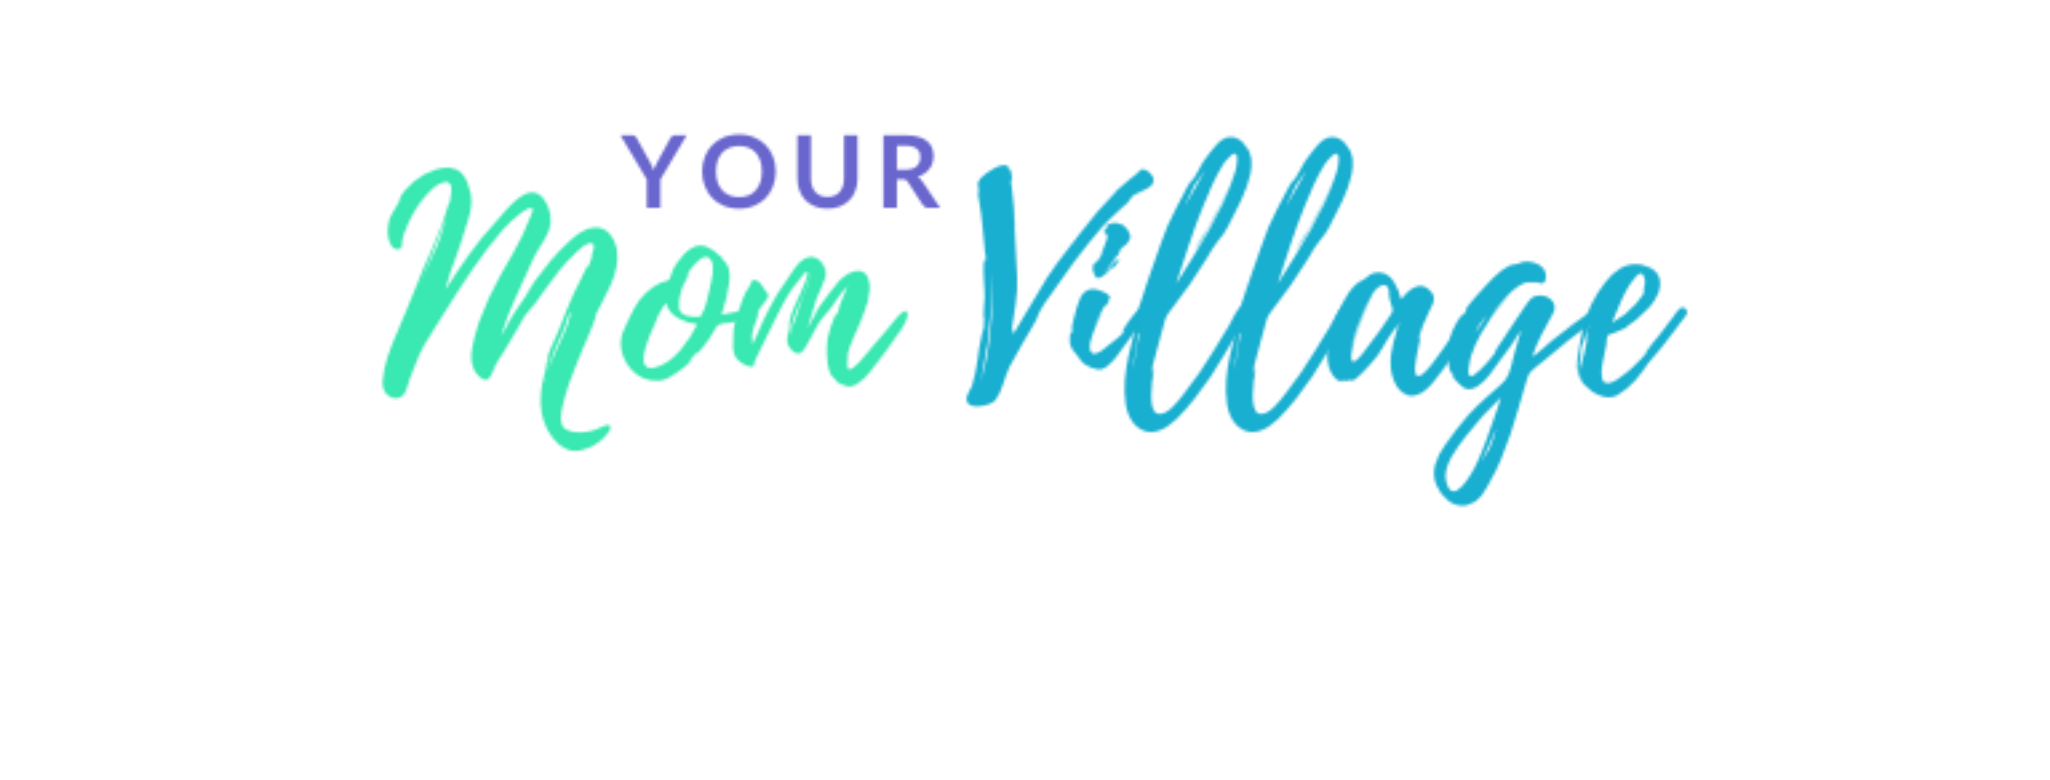 Your Mom Village Logo